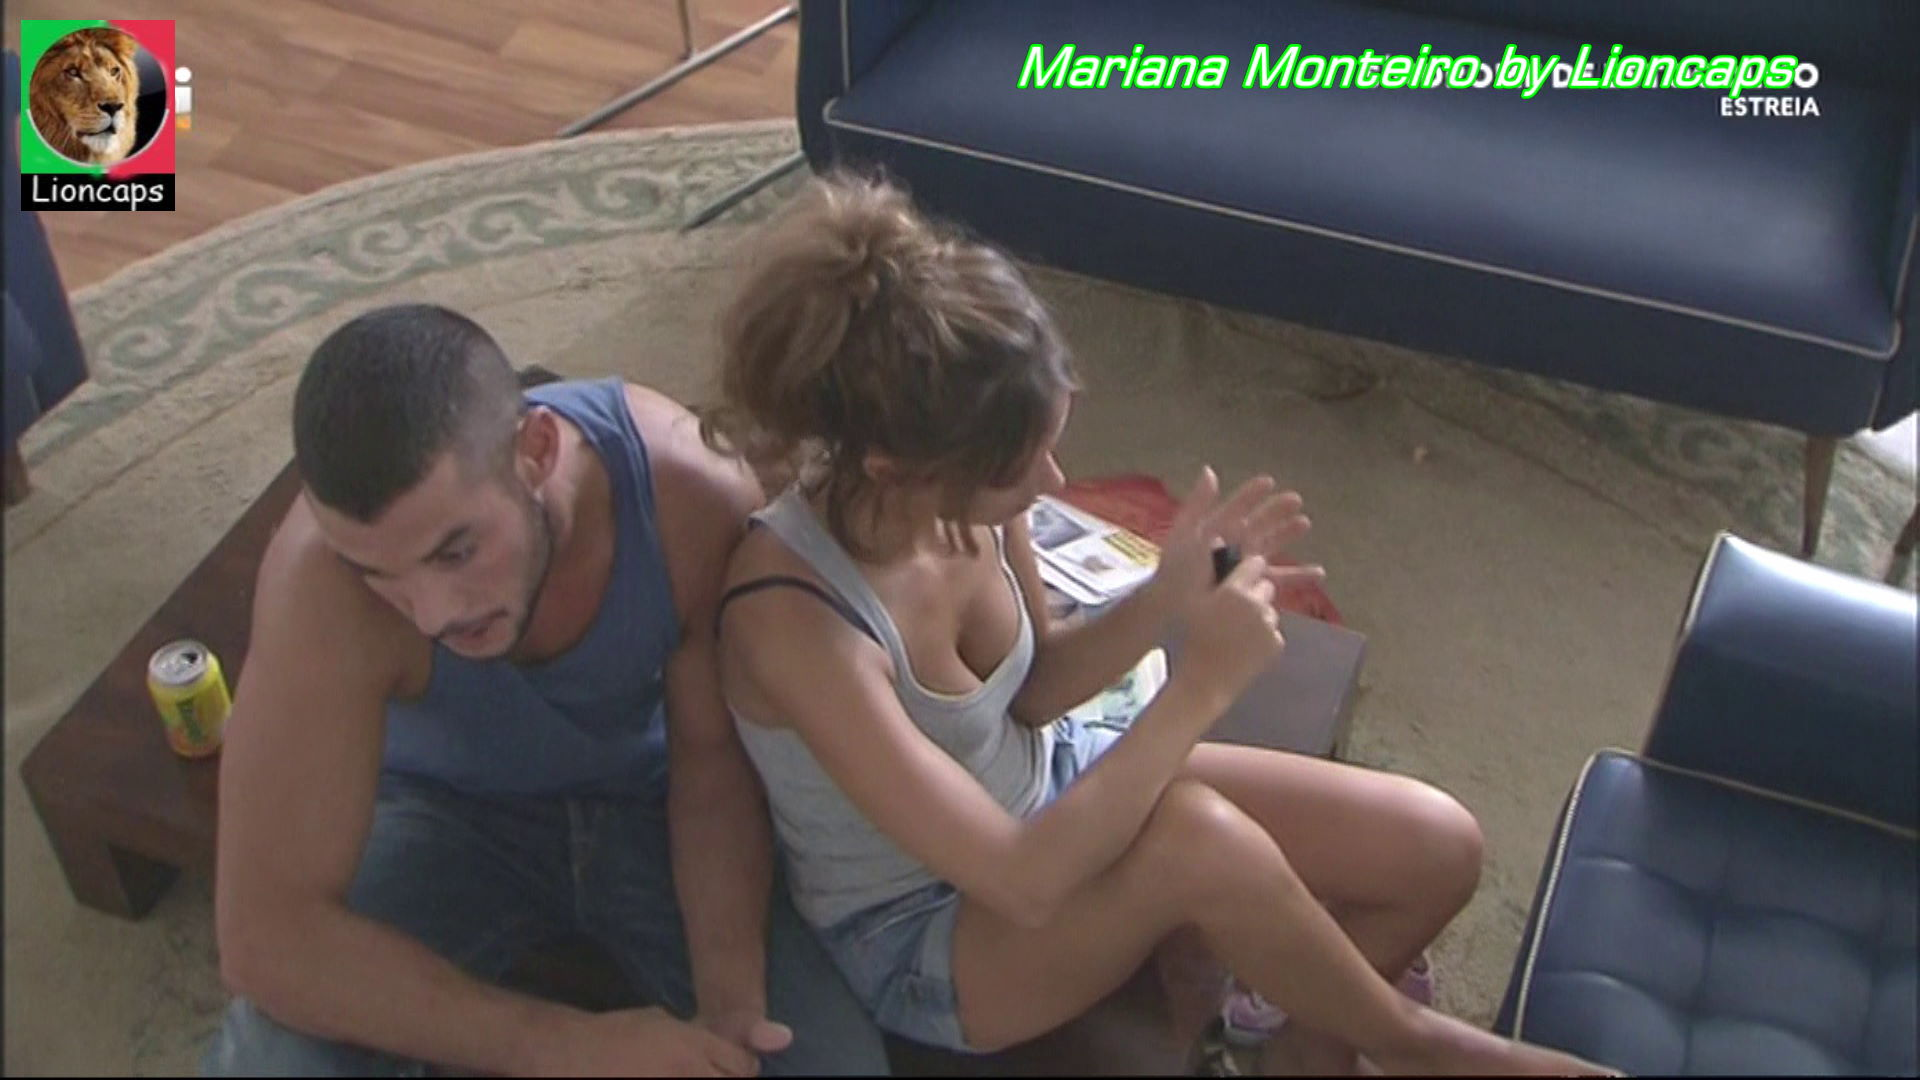 332235477_mariana_monteiro_sindrome_estocolmo_vs180130_00115_122_400lo.JPG